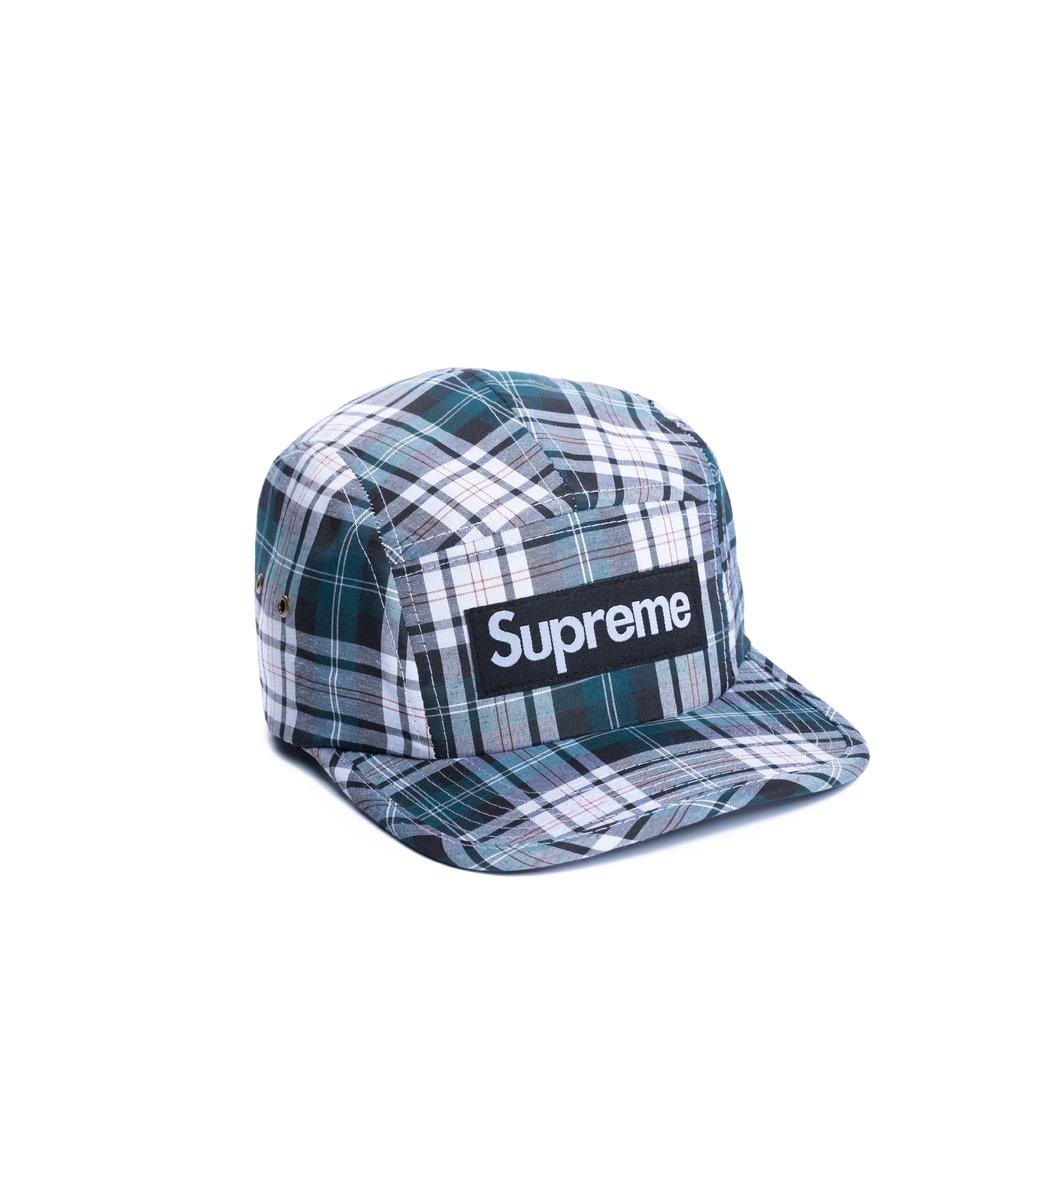 Кепка Supreme Cell (серо-зелёный/чёрный)